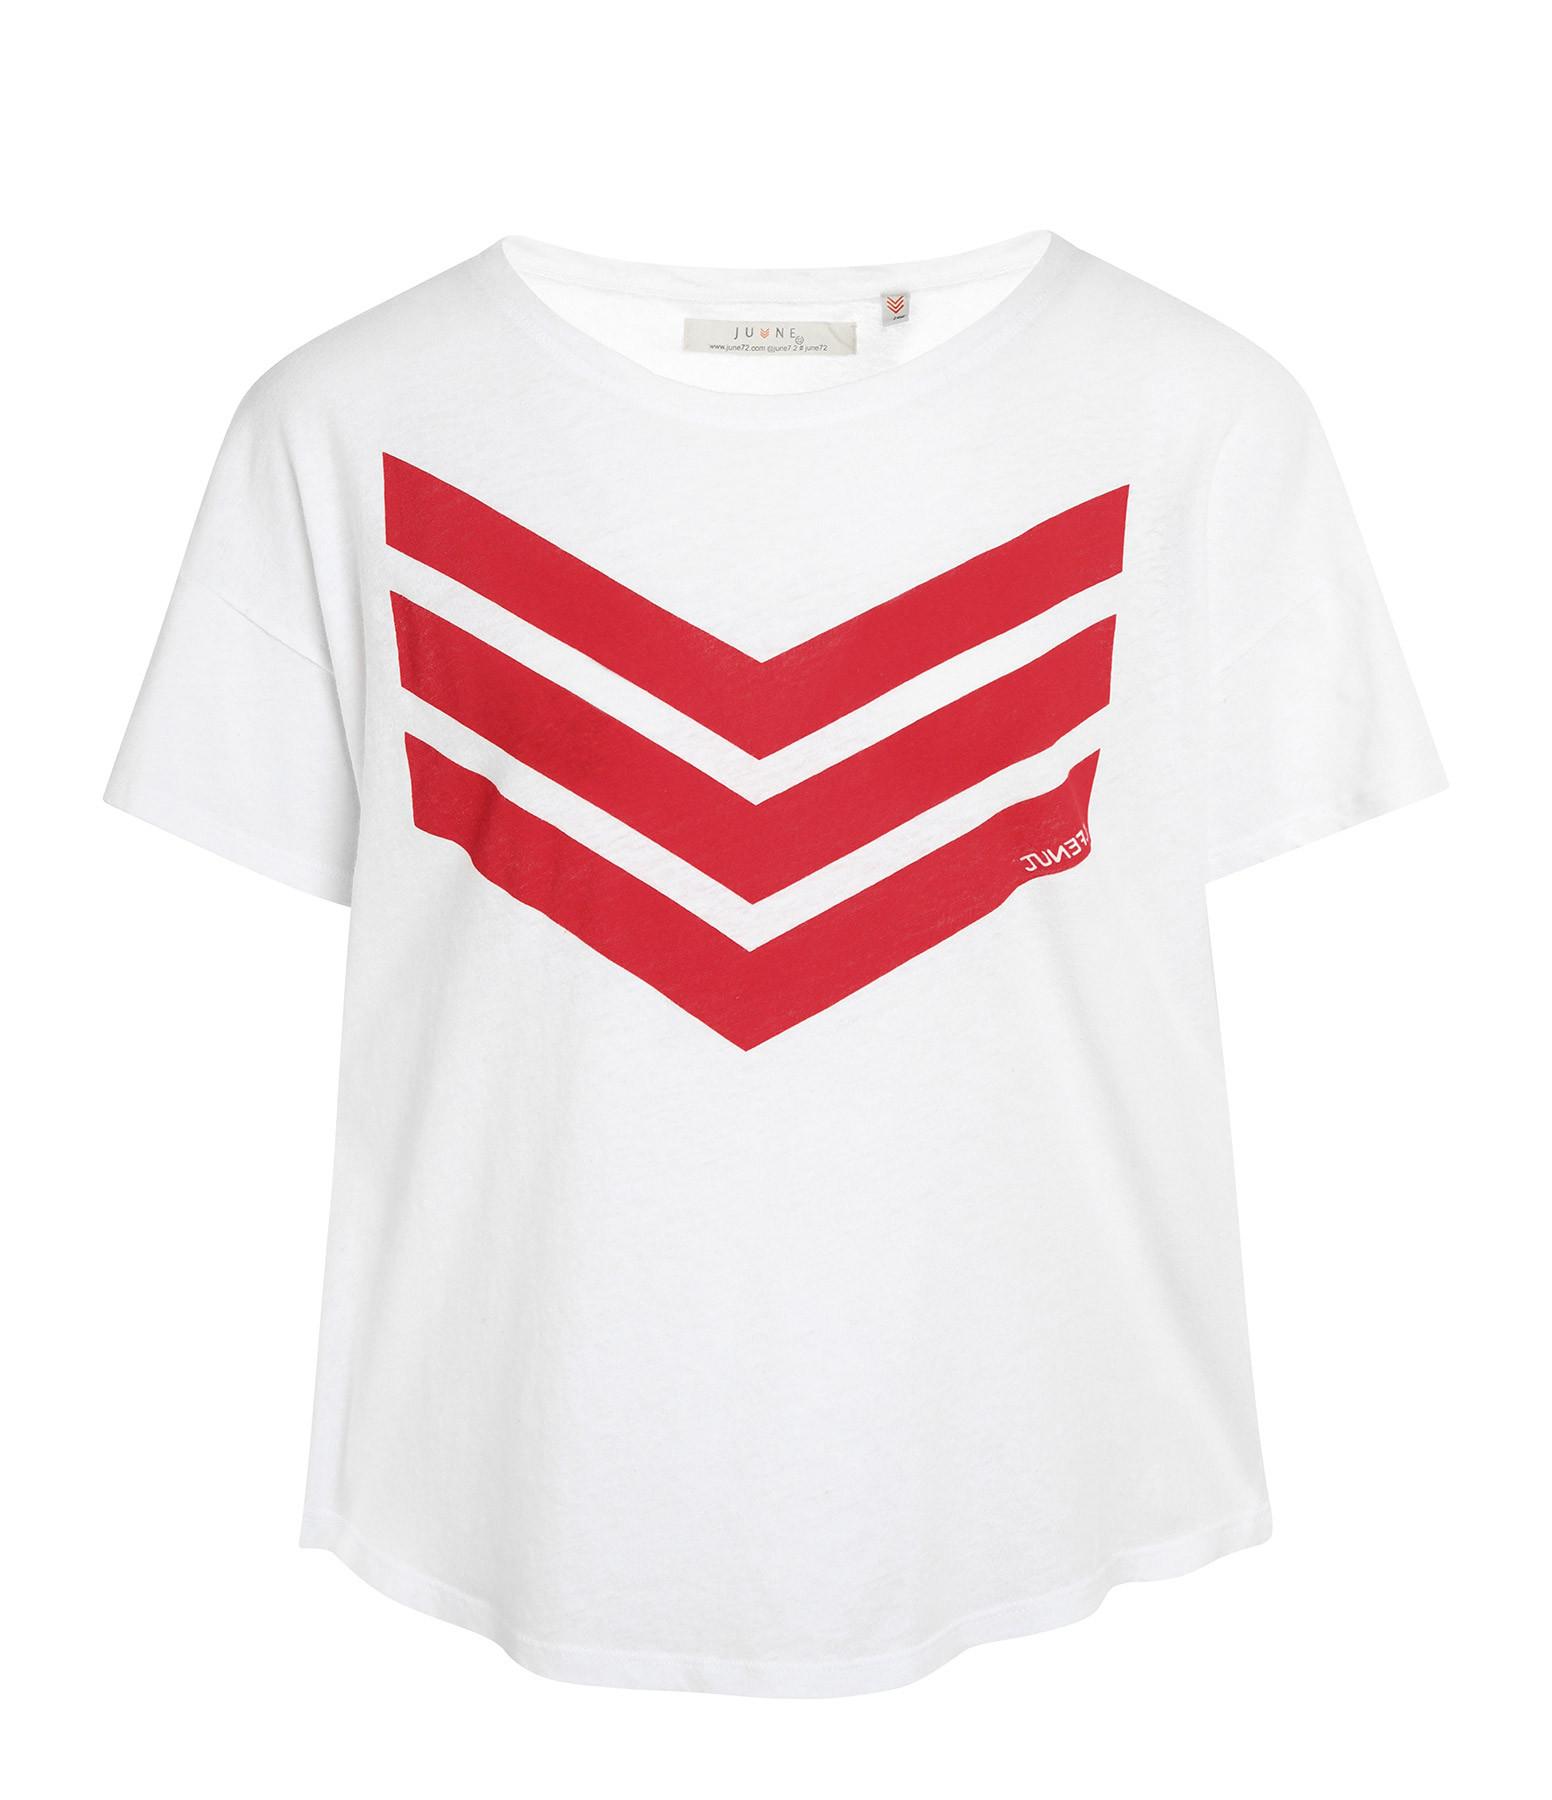 JUNE 7.2 - Tee-shirt Uma Coton Lin Blanc Logo Rouge